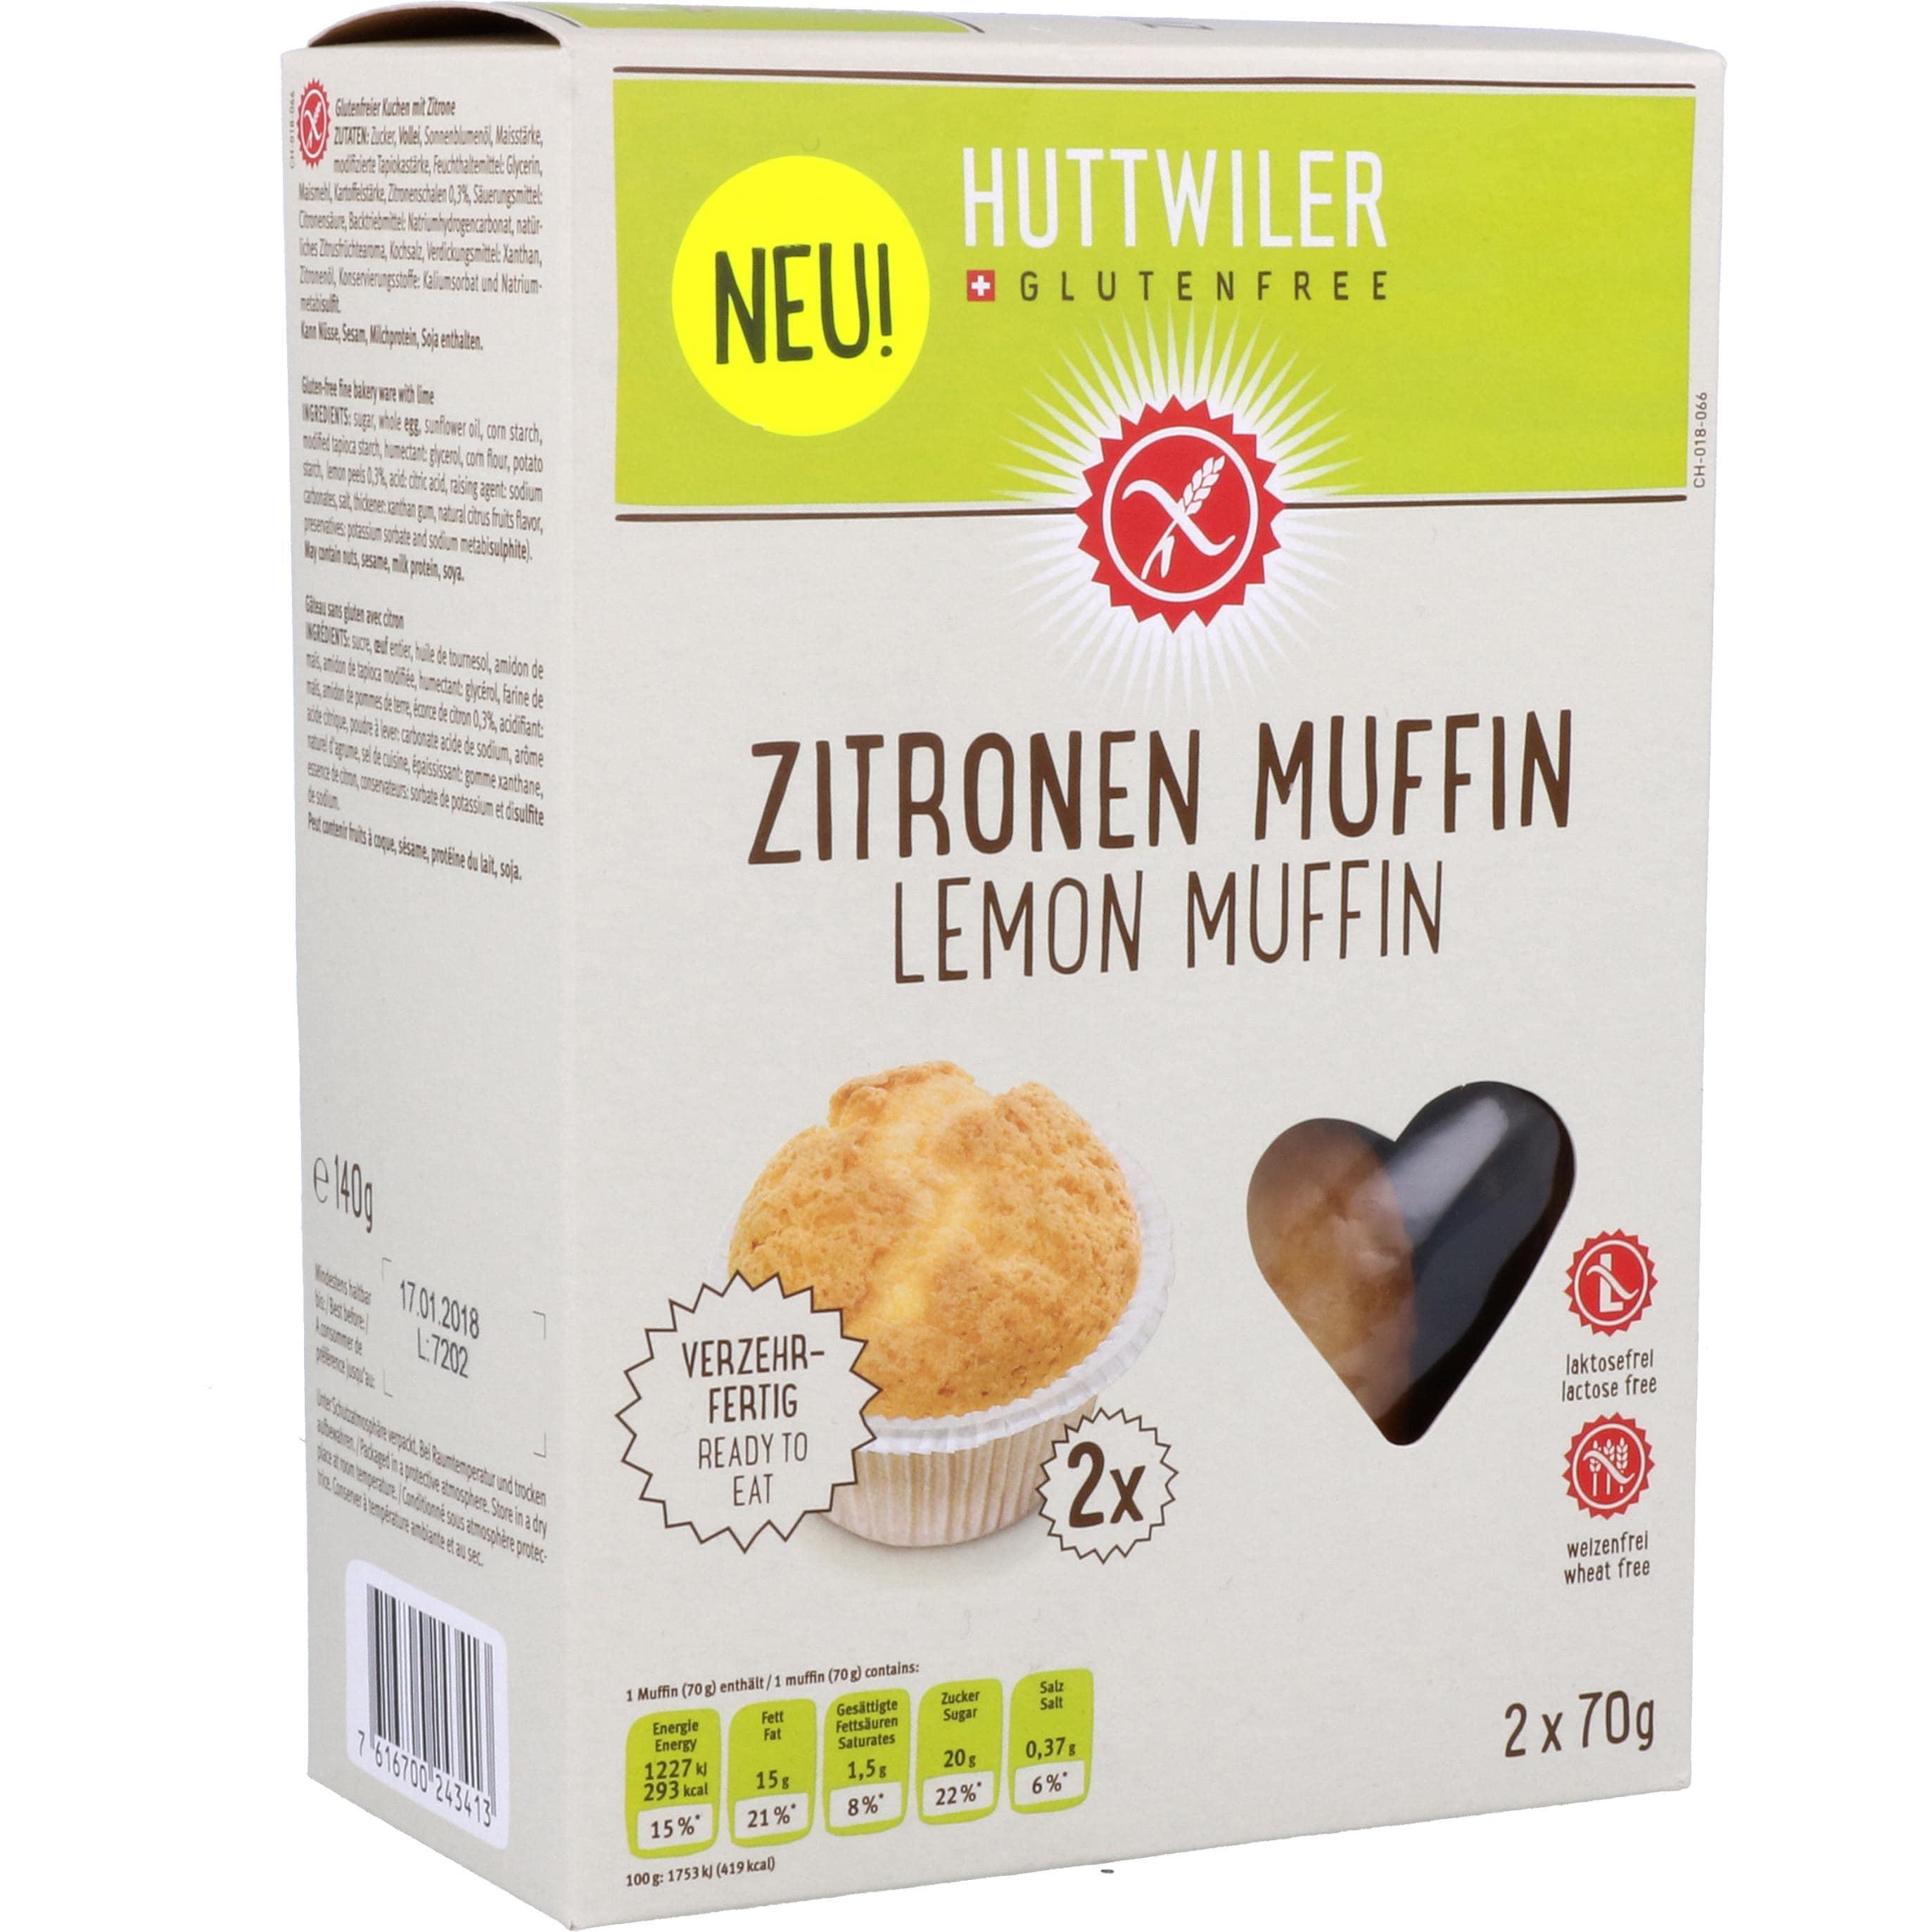 Huttwiler Zitronen Muffin 140g